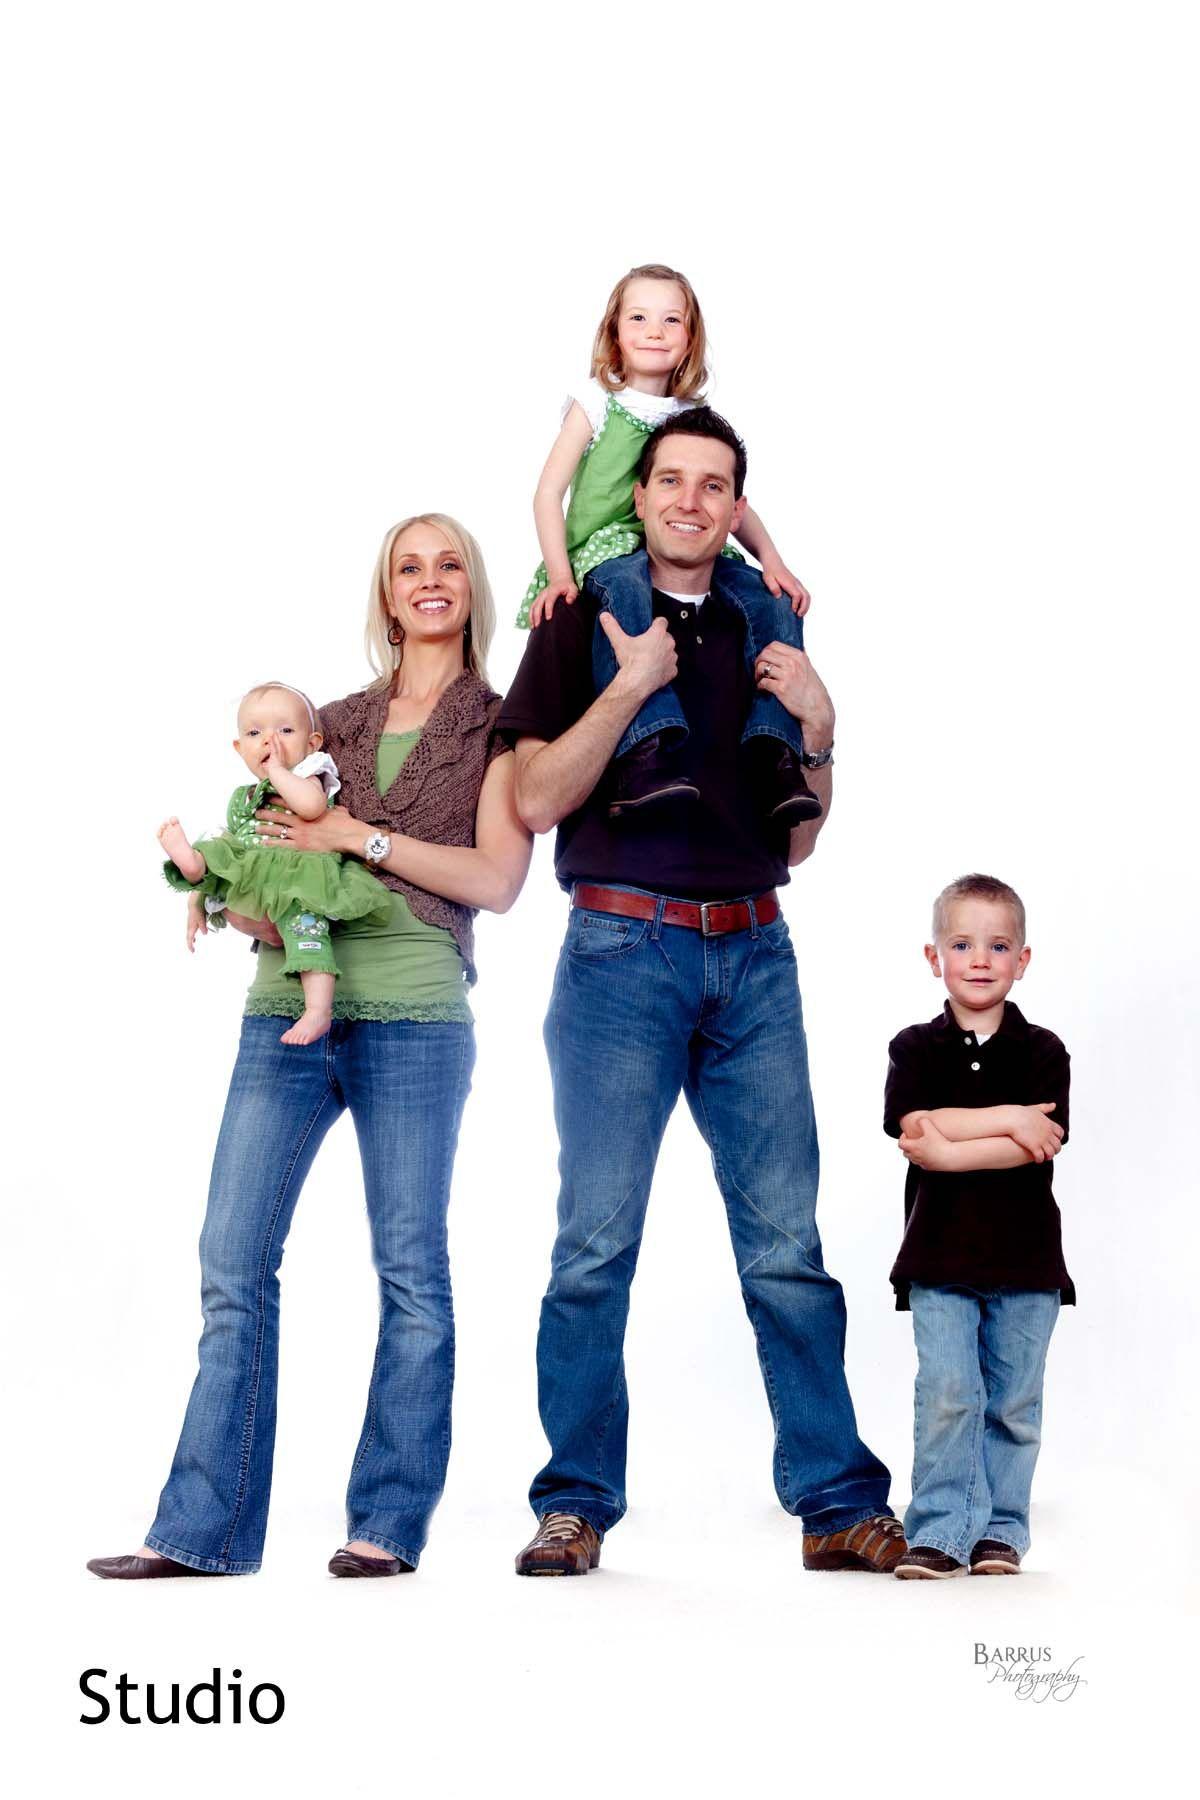 Fun White Background Family Picture Family Photo Pose Family Photos Family Photoshoot